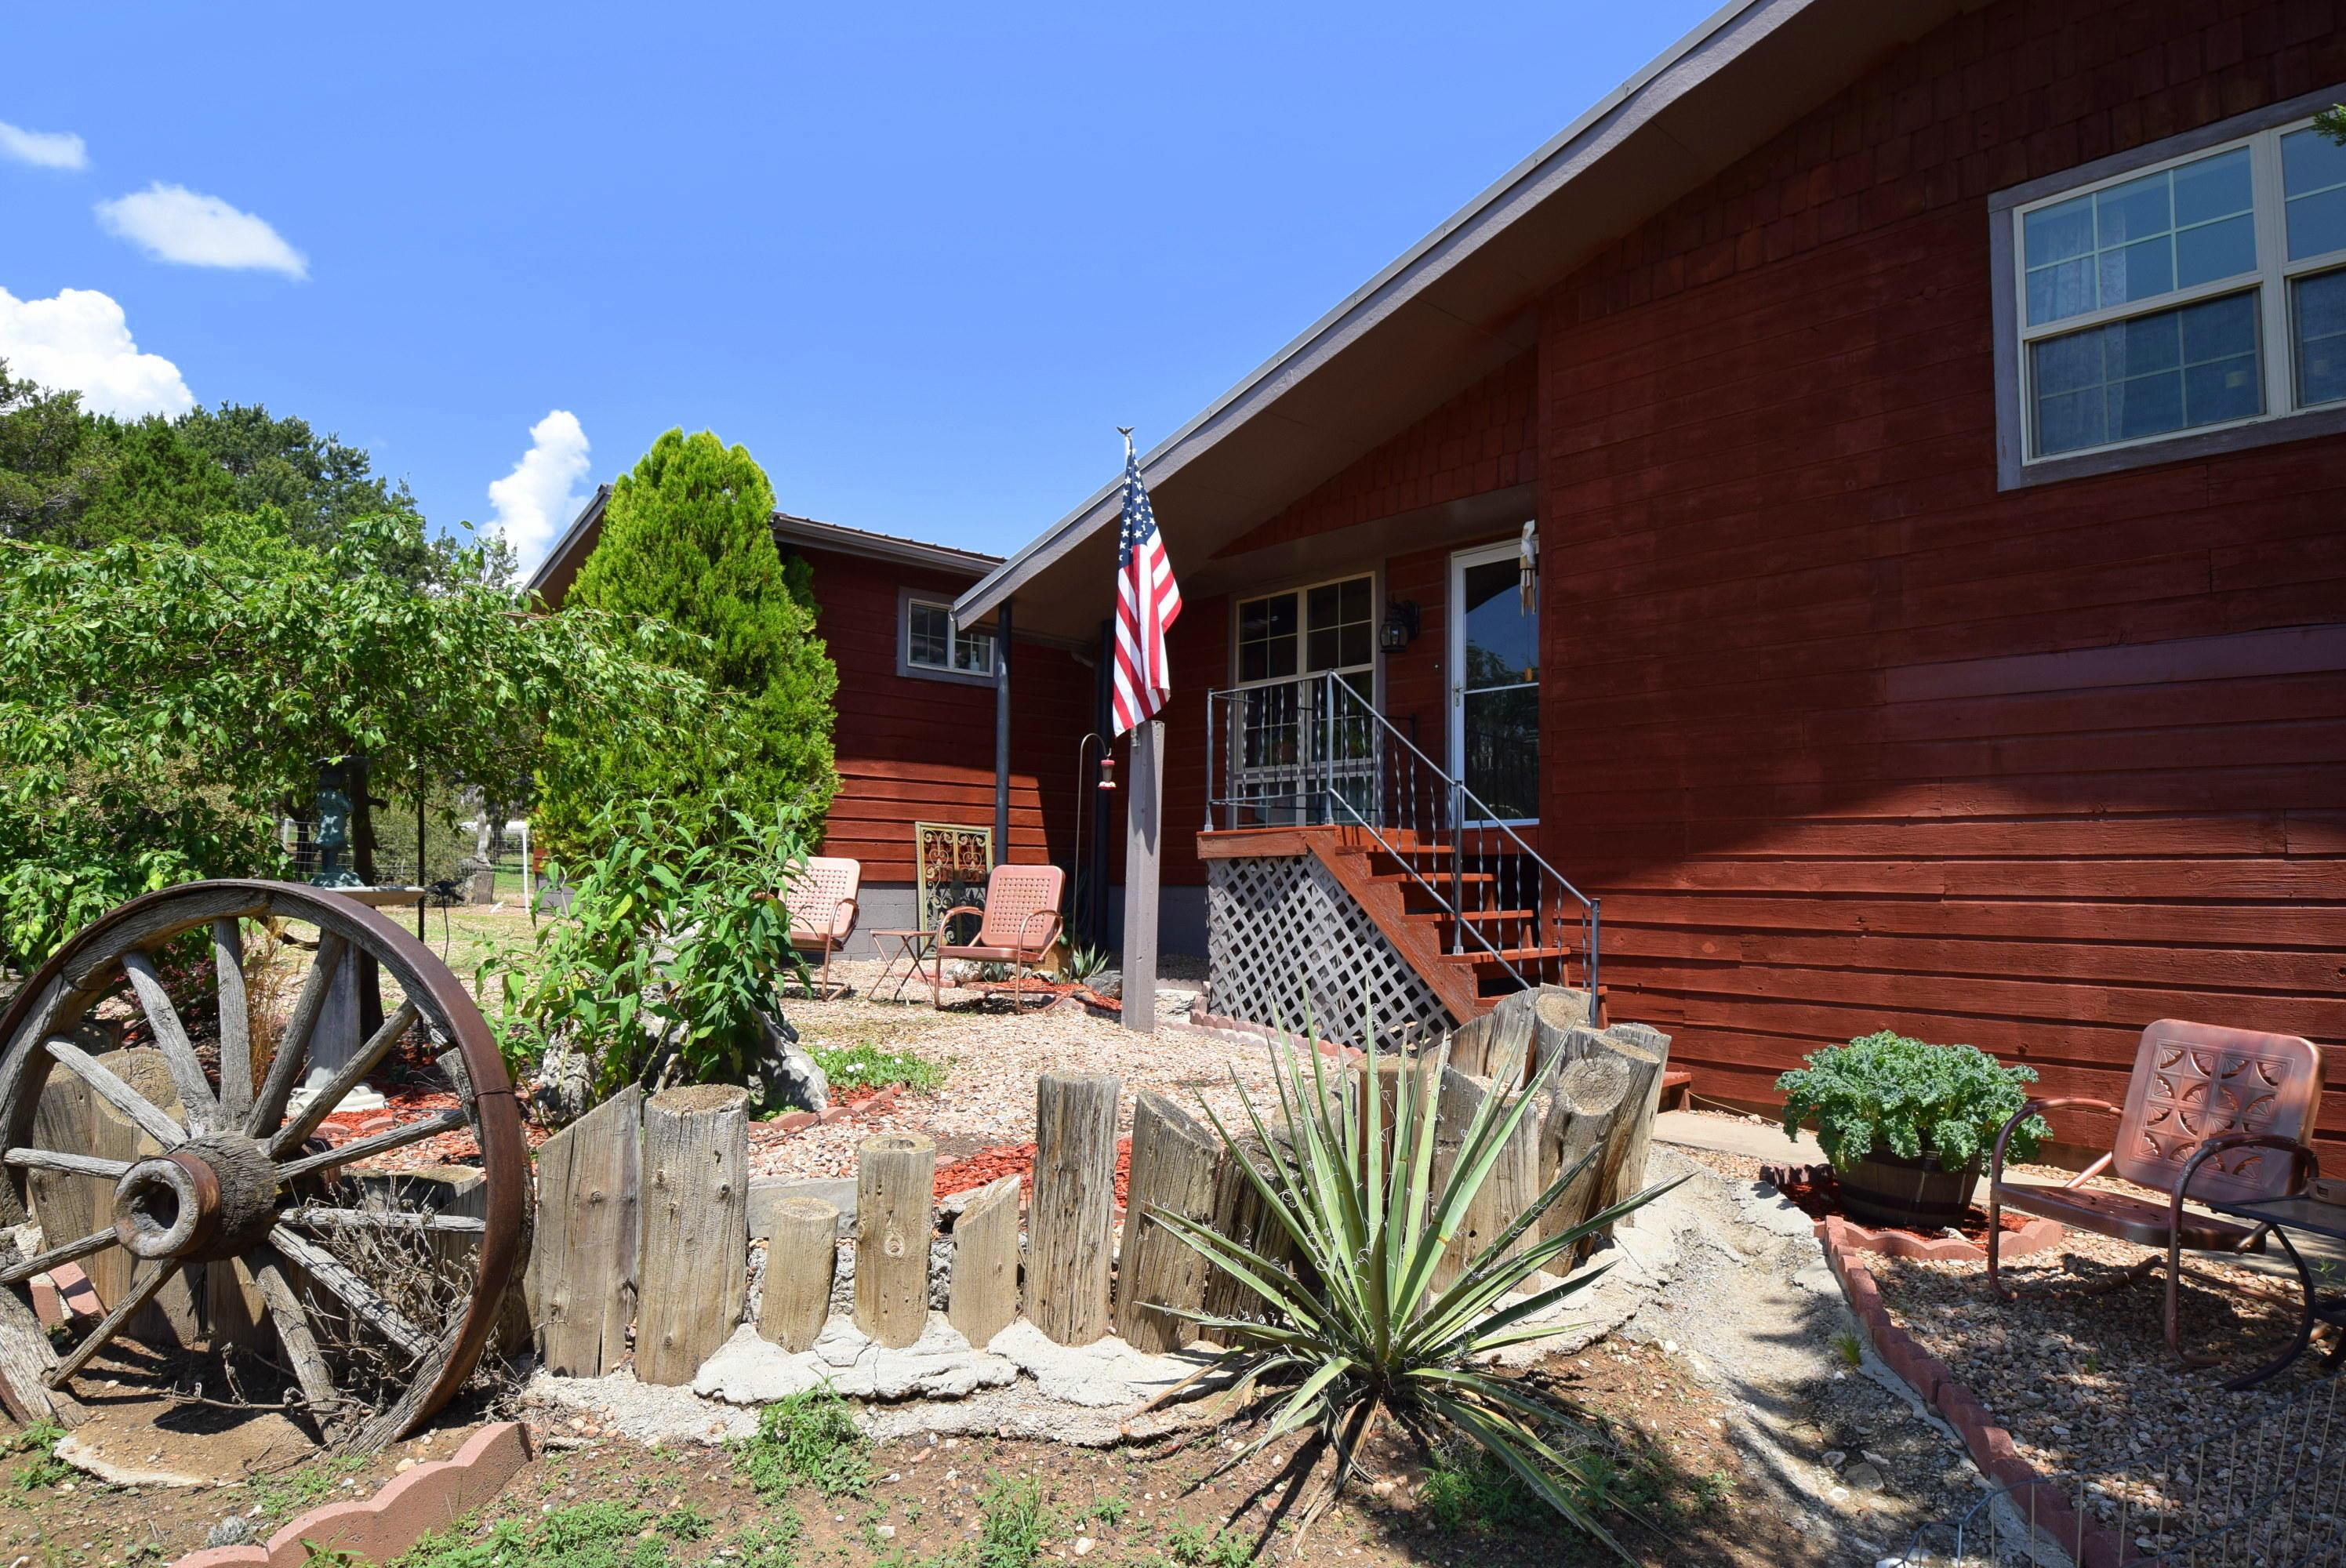 1 West Willard, Edgewood NM 87015